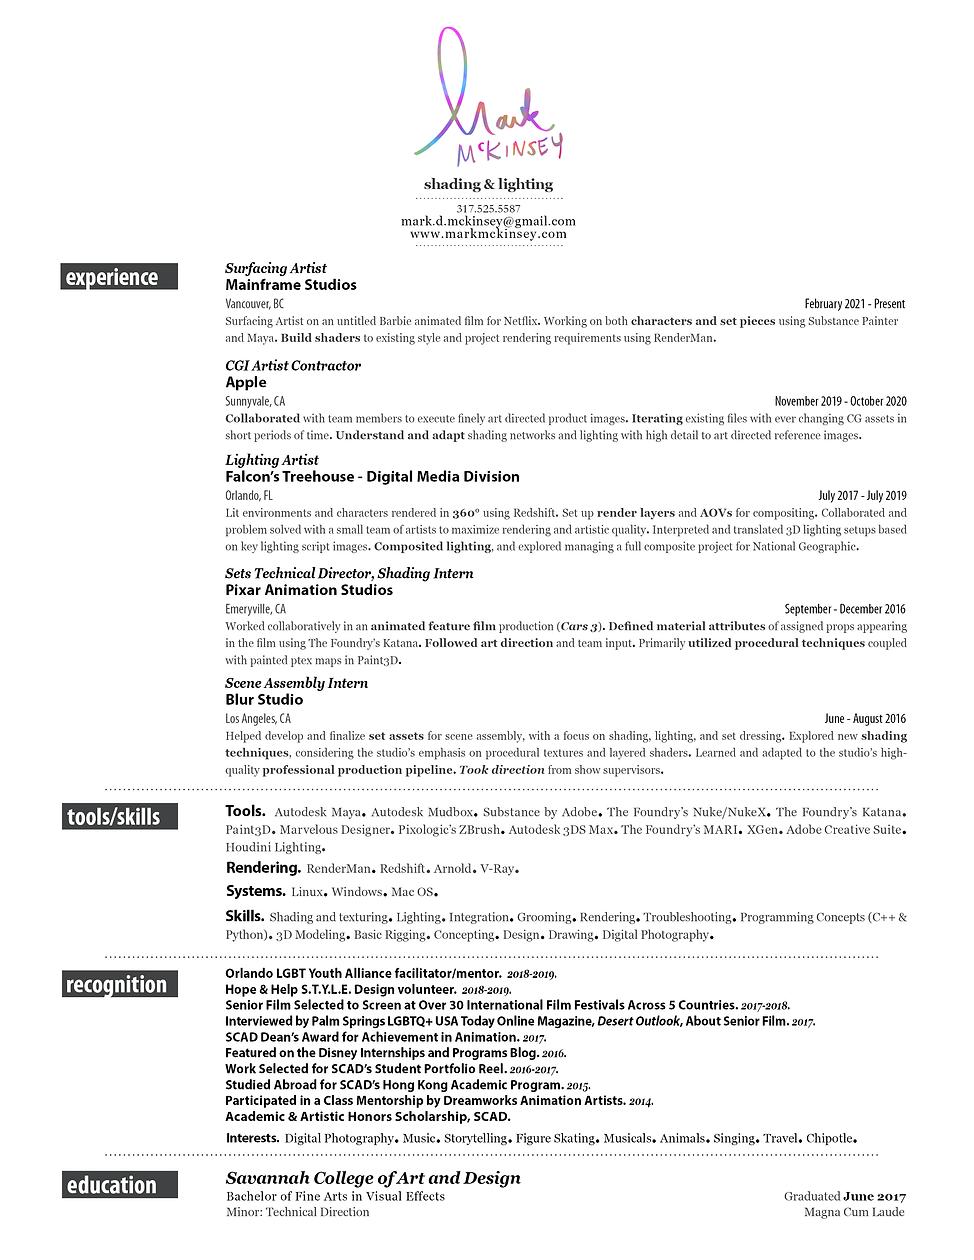 markMcKinseyResume2021.png